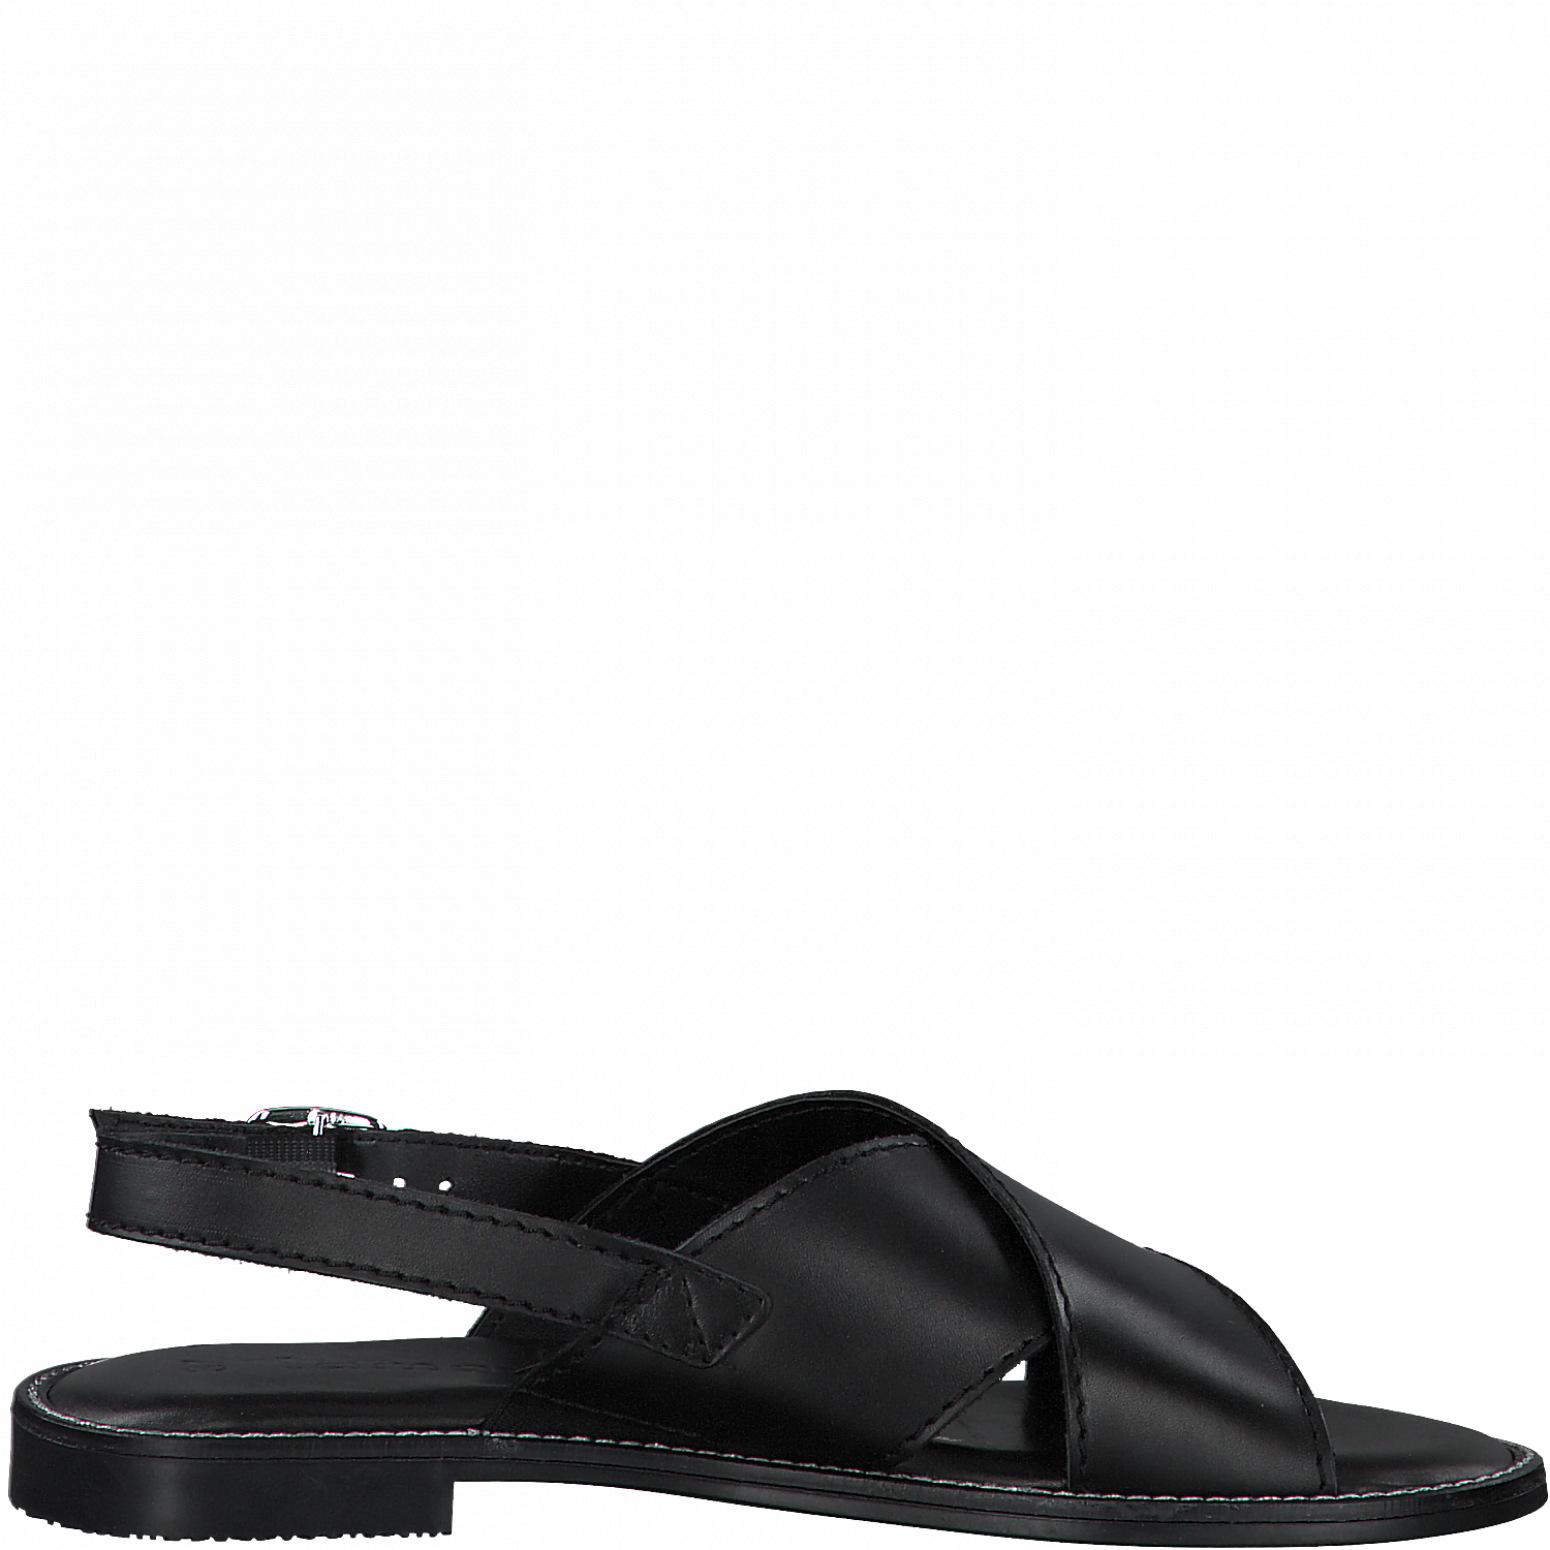 Tamaris 28119 sandal, black leather, 37